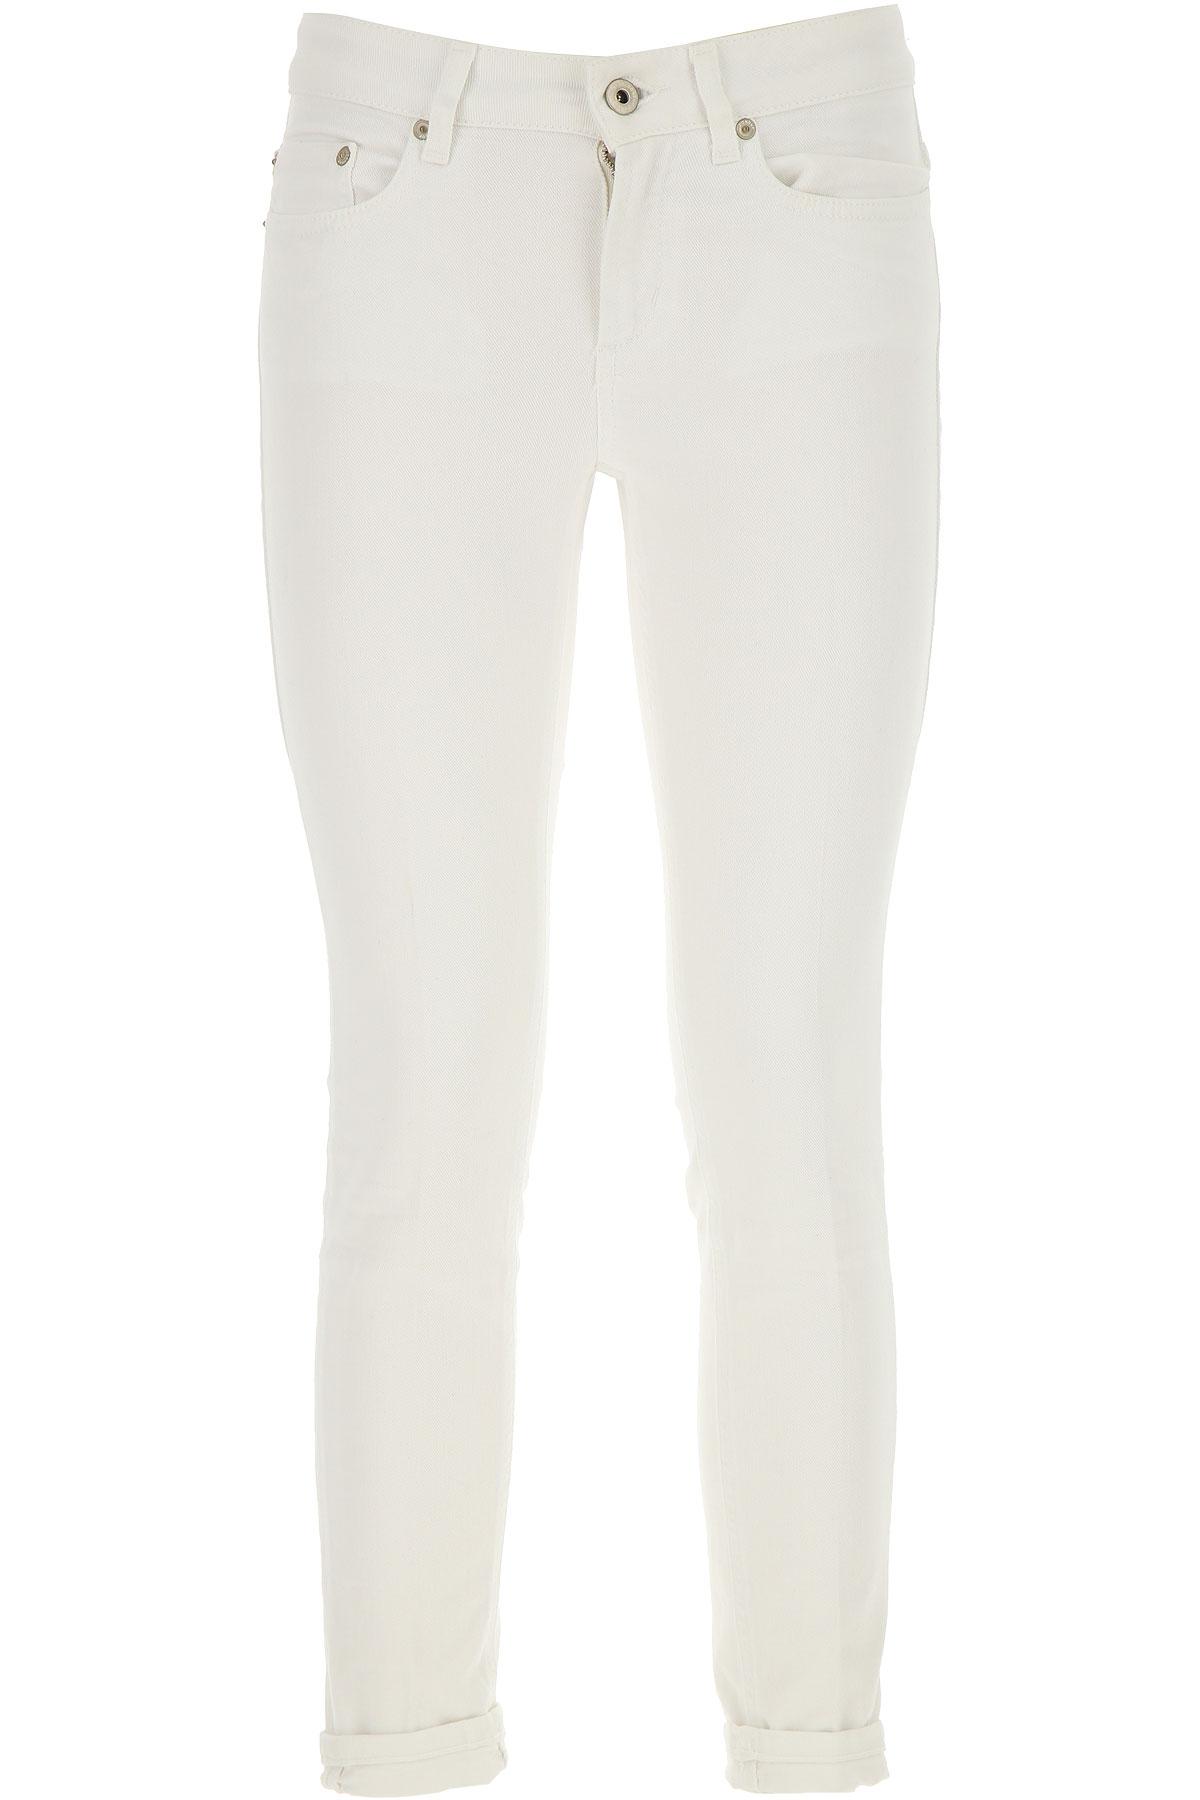 Dondup Jeans, White, Cotton, 2017, 25 26 27 28 29 30